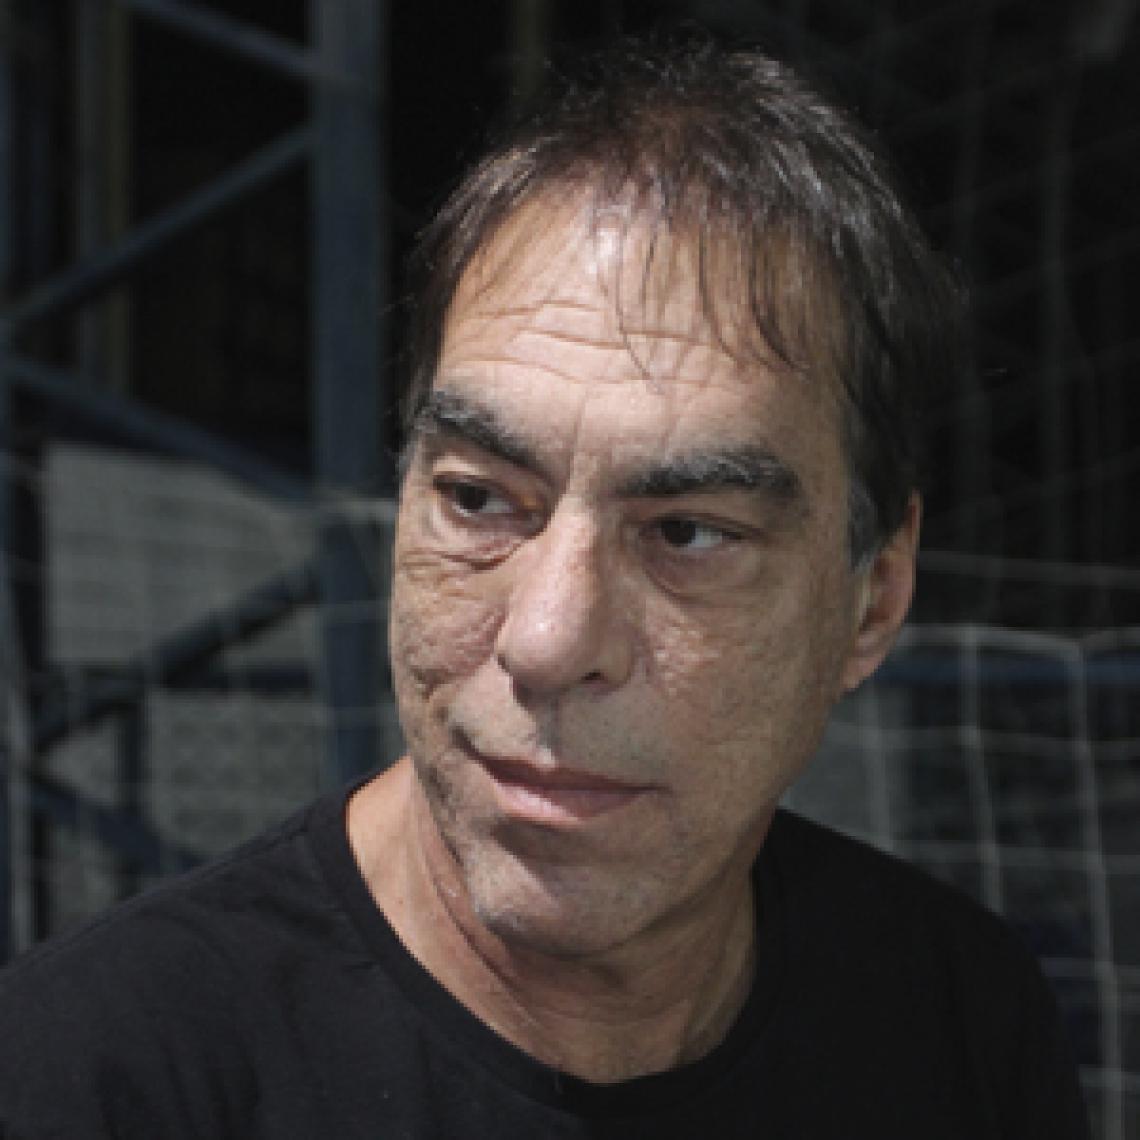 Demétrio Magnolli